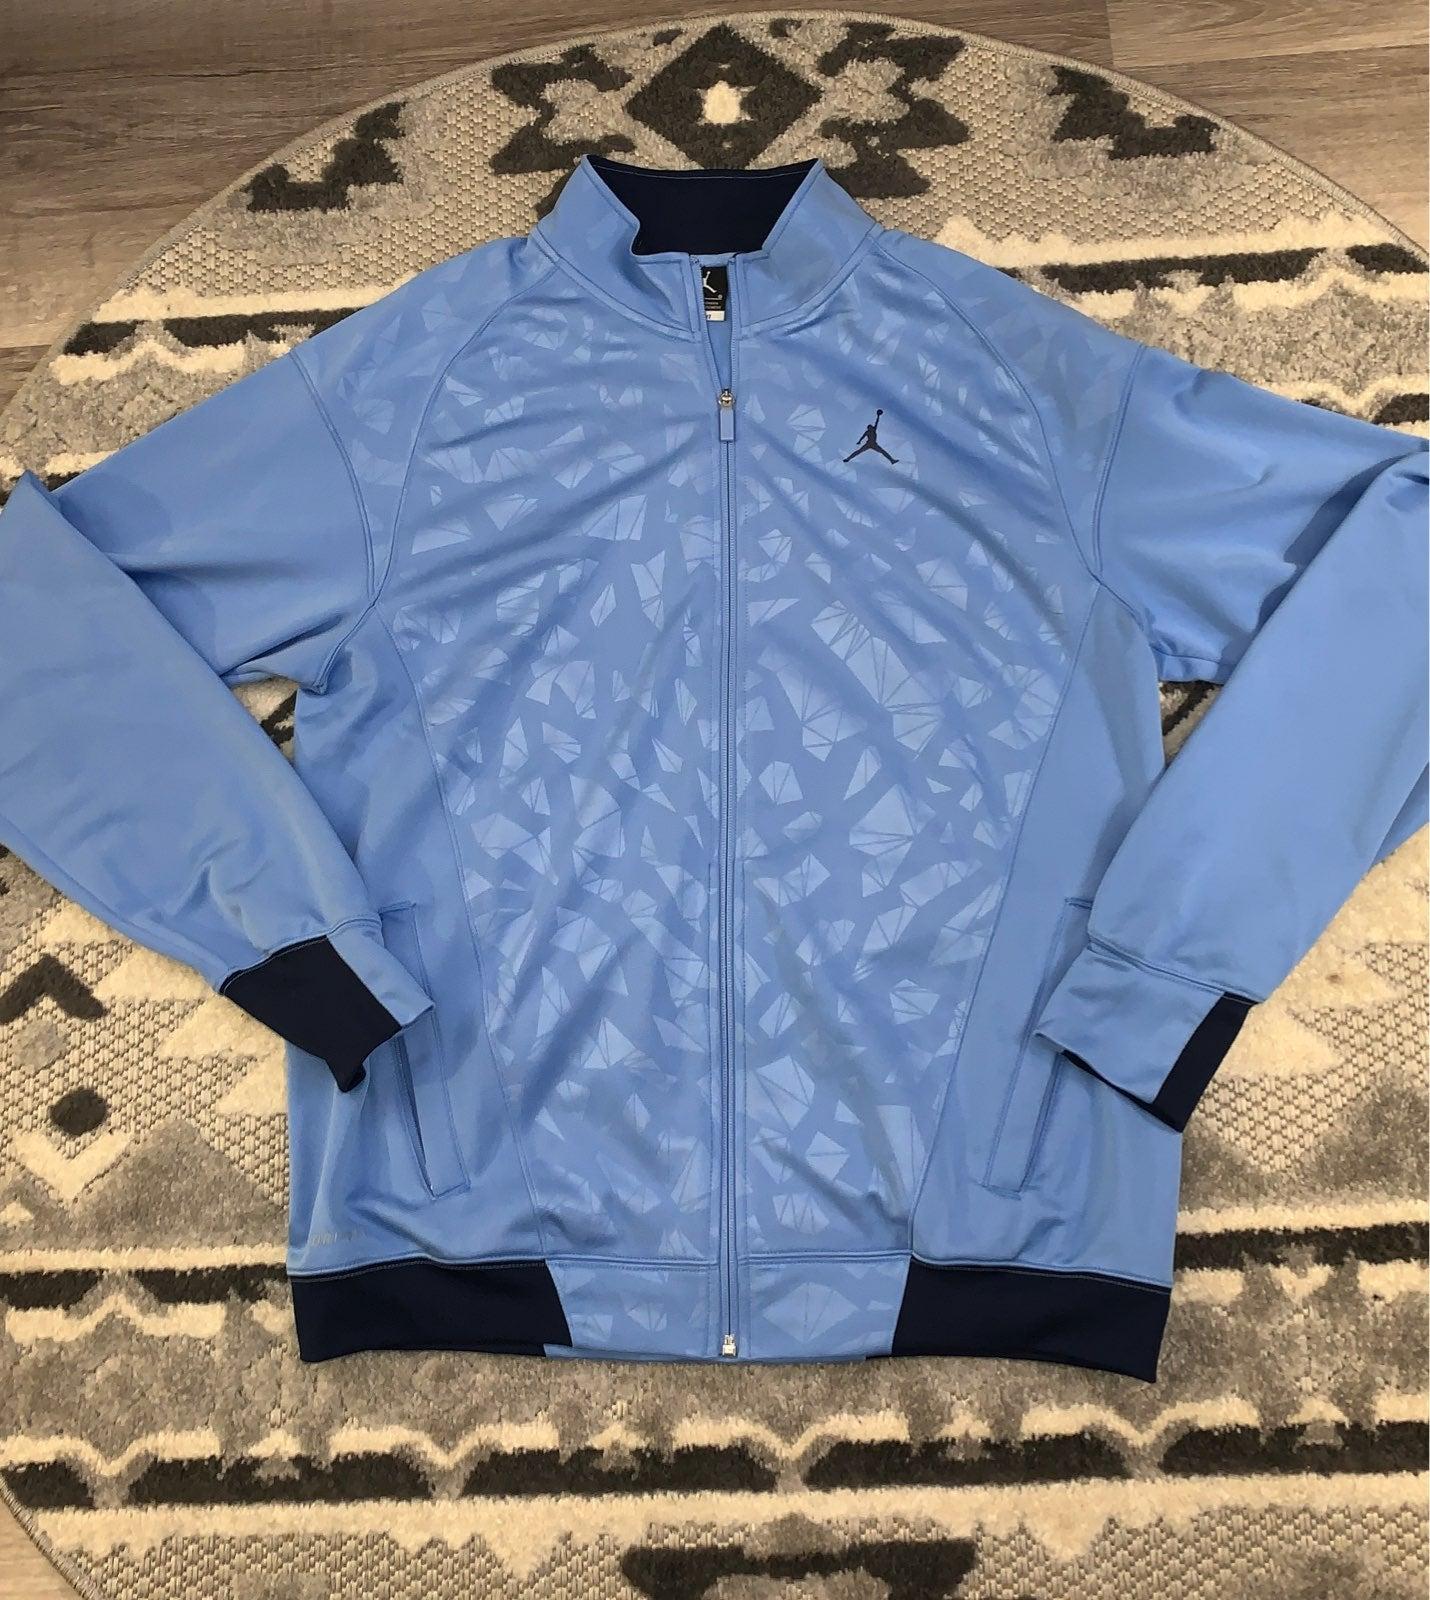 Nike Jordan Tarheels Jacket